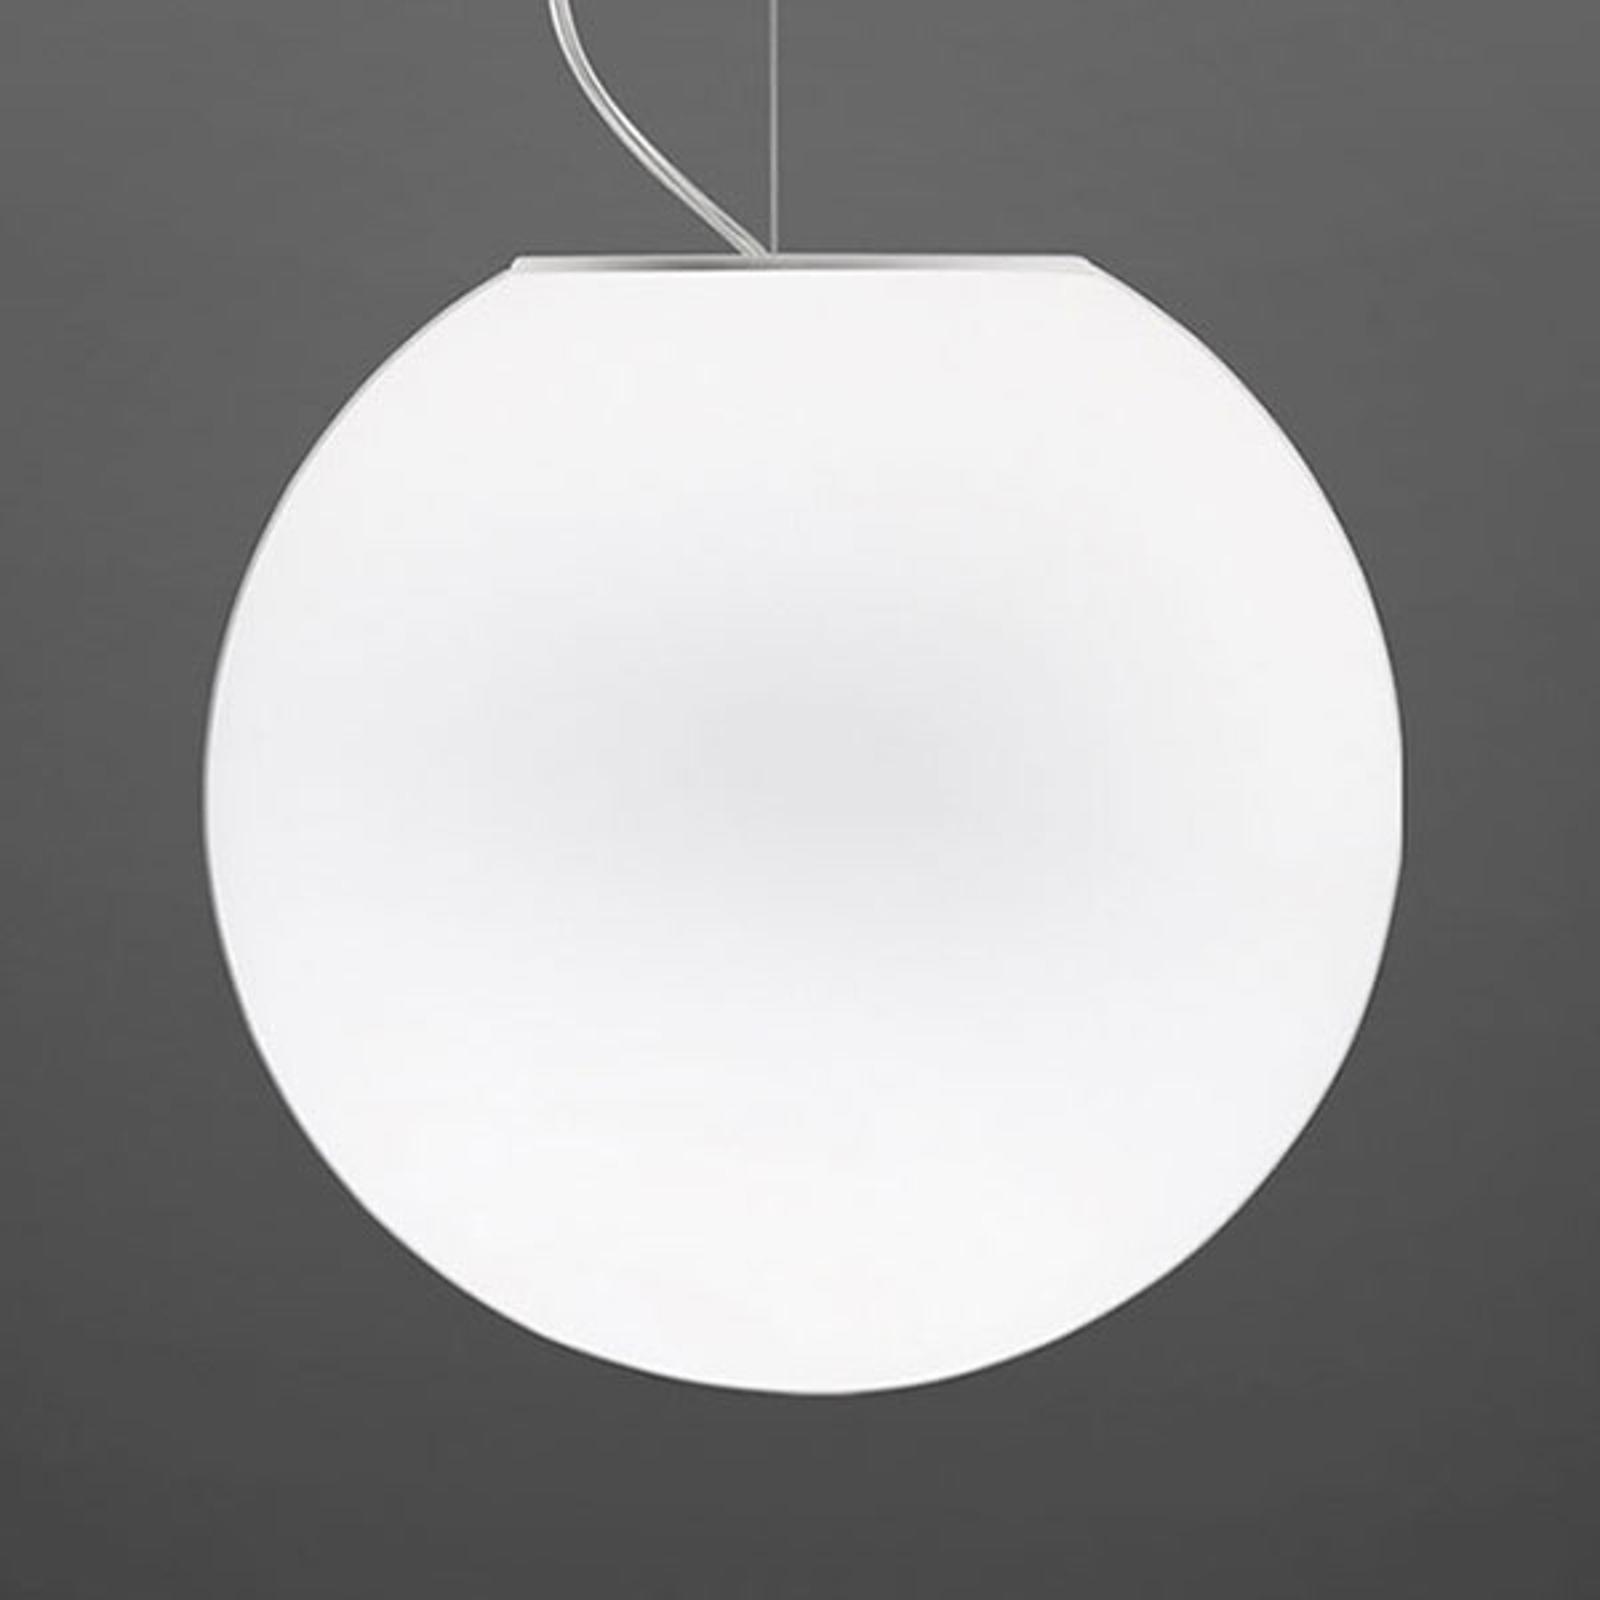 Fabbian Lumi Sfera glazen hanglamp, Ø 40 cm